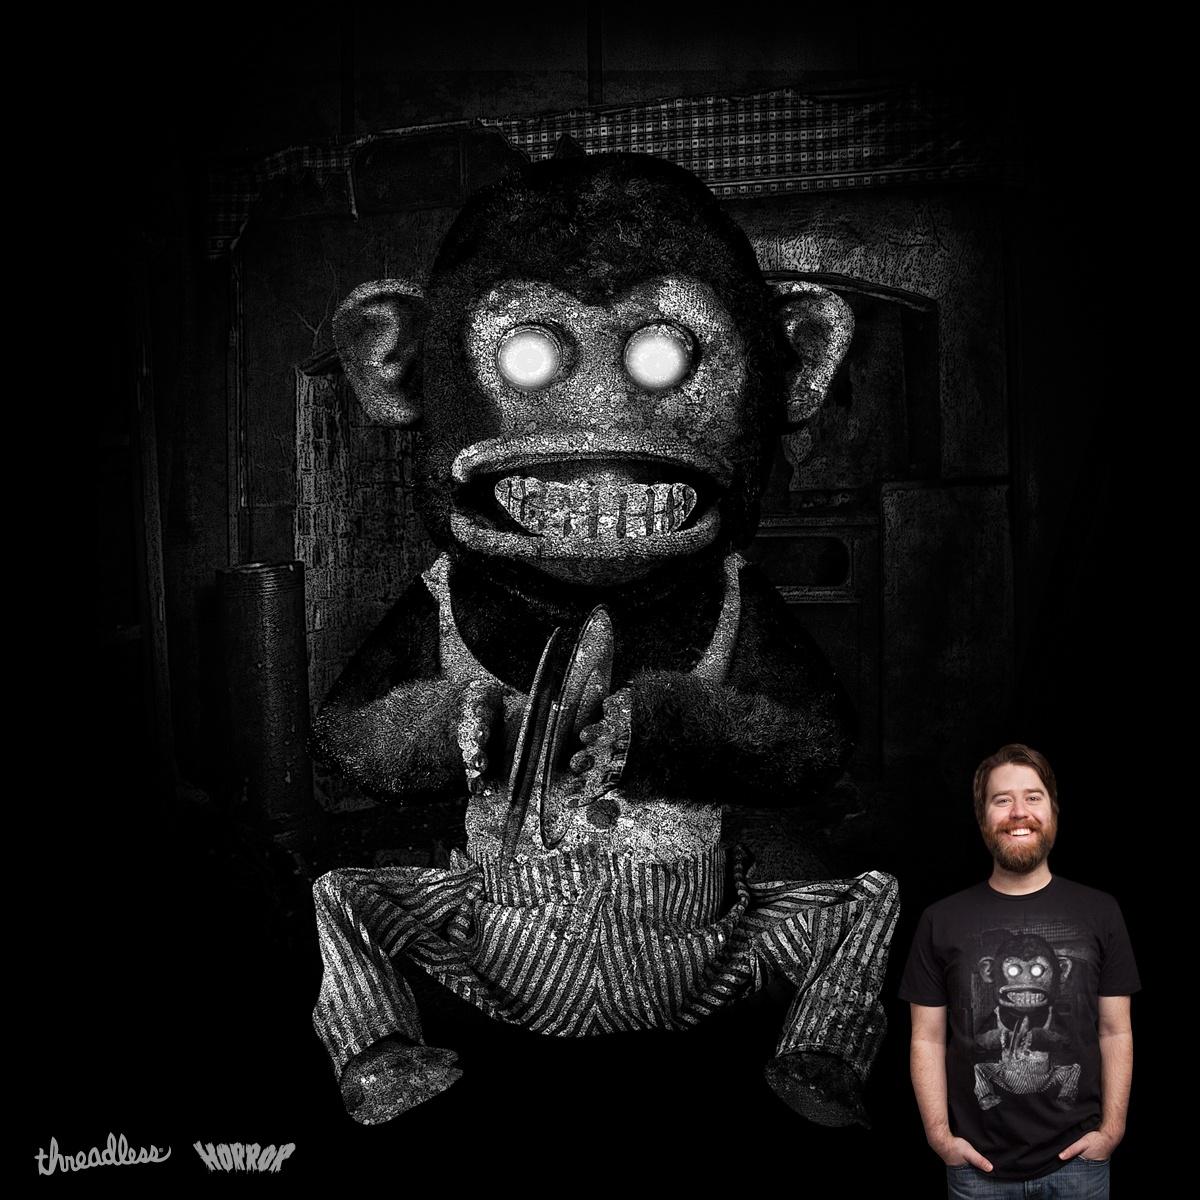 Creepy Chimp by Joe Conde on Threadless